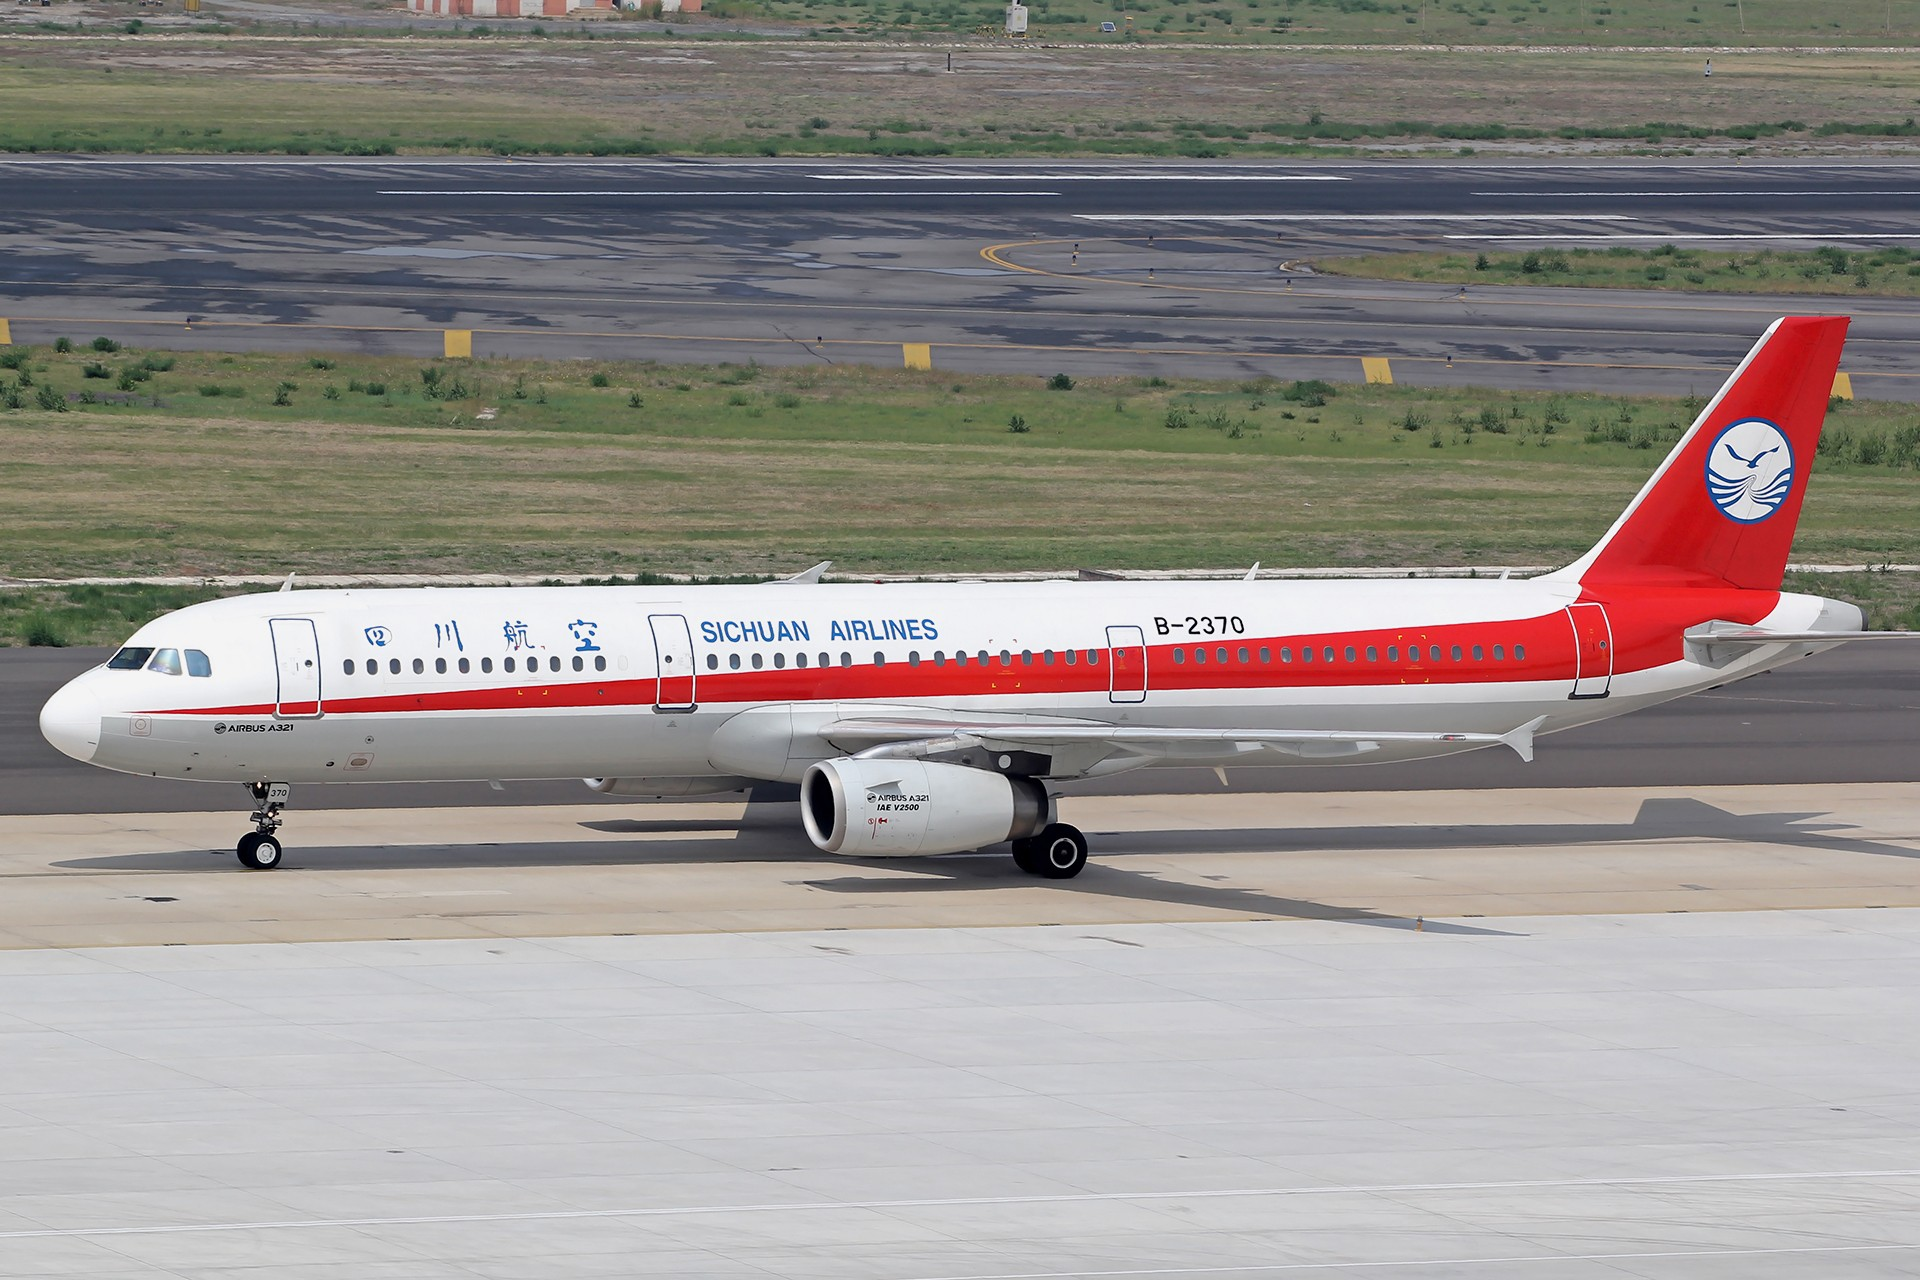 Re:[原创][DLC]雨过天晴,春意盎然…….. AIRBUS A321-200 B-2370 中国大连周水子国际机场